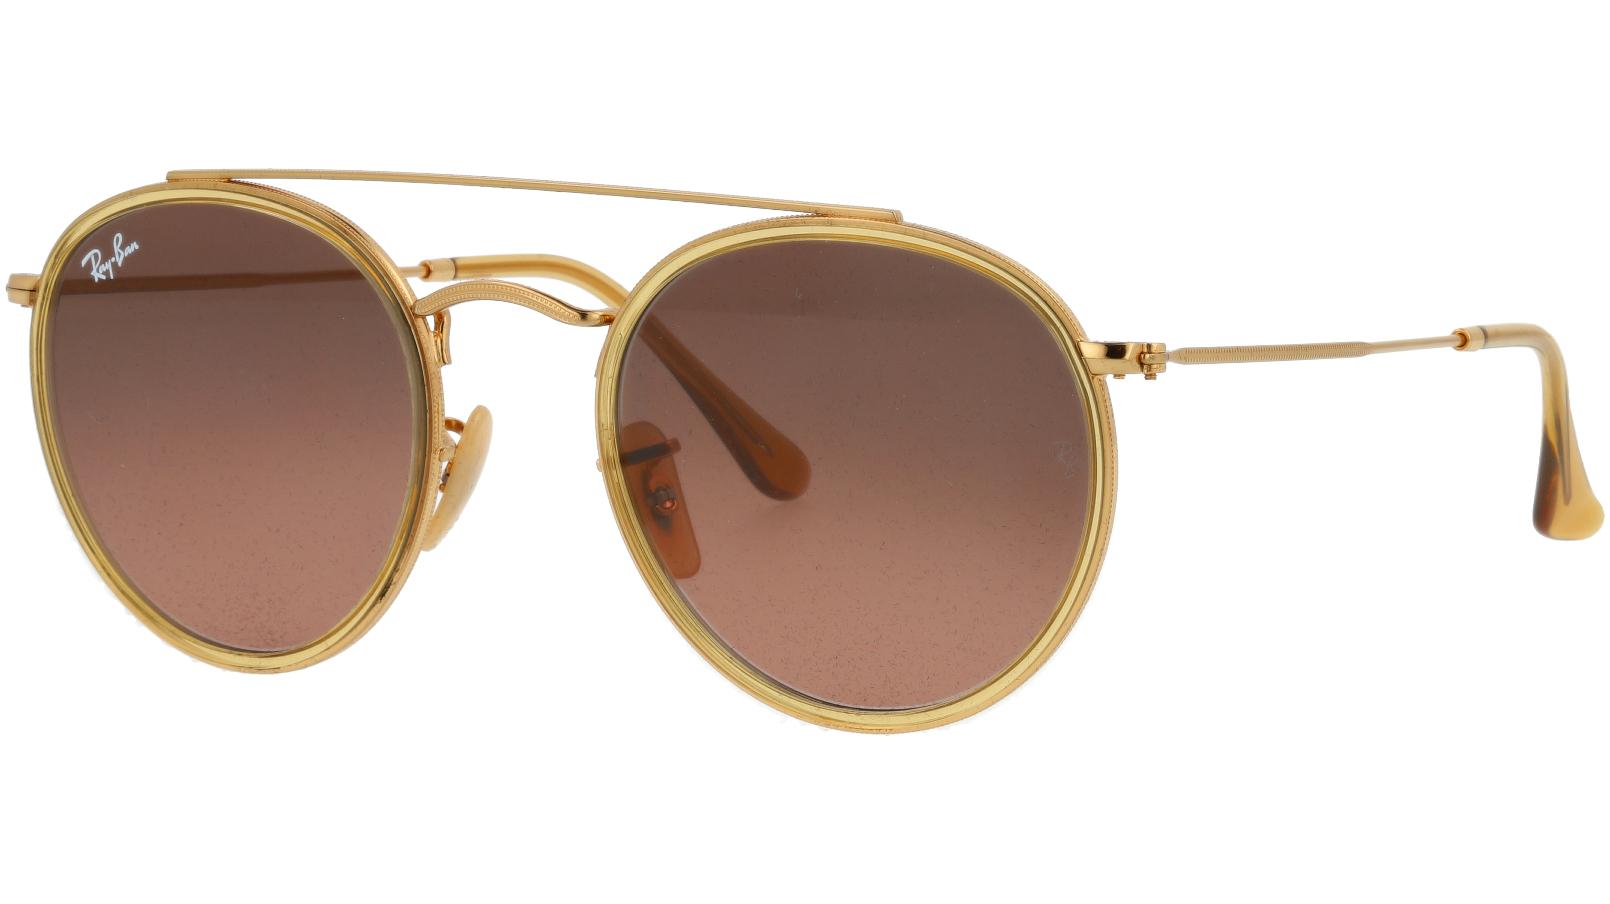 Ray-Ban RB3647N 912443 Arista Round Sunglasses